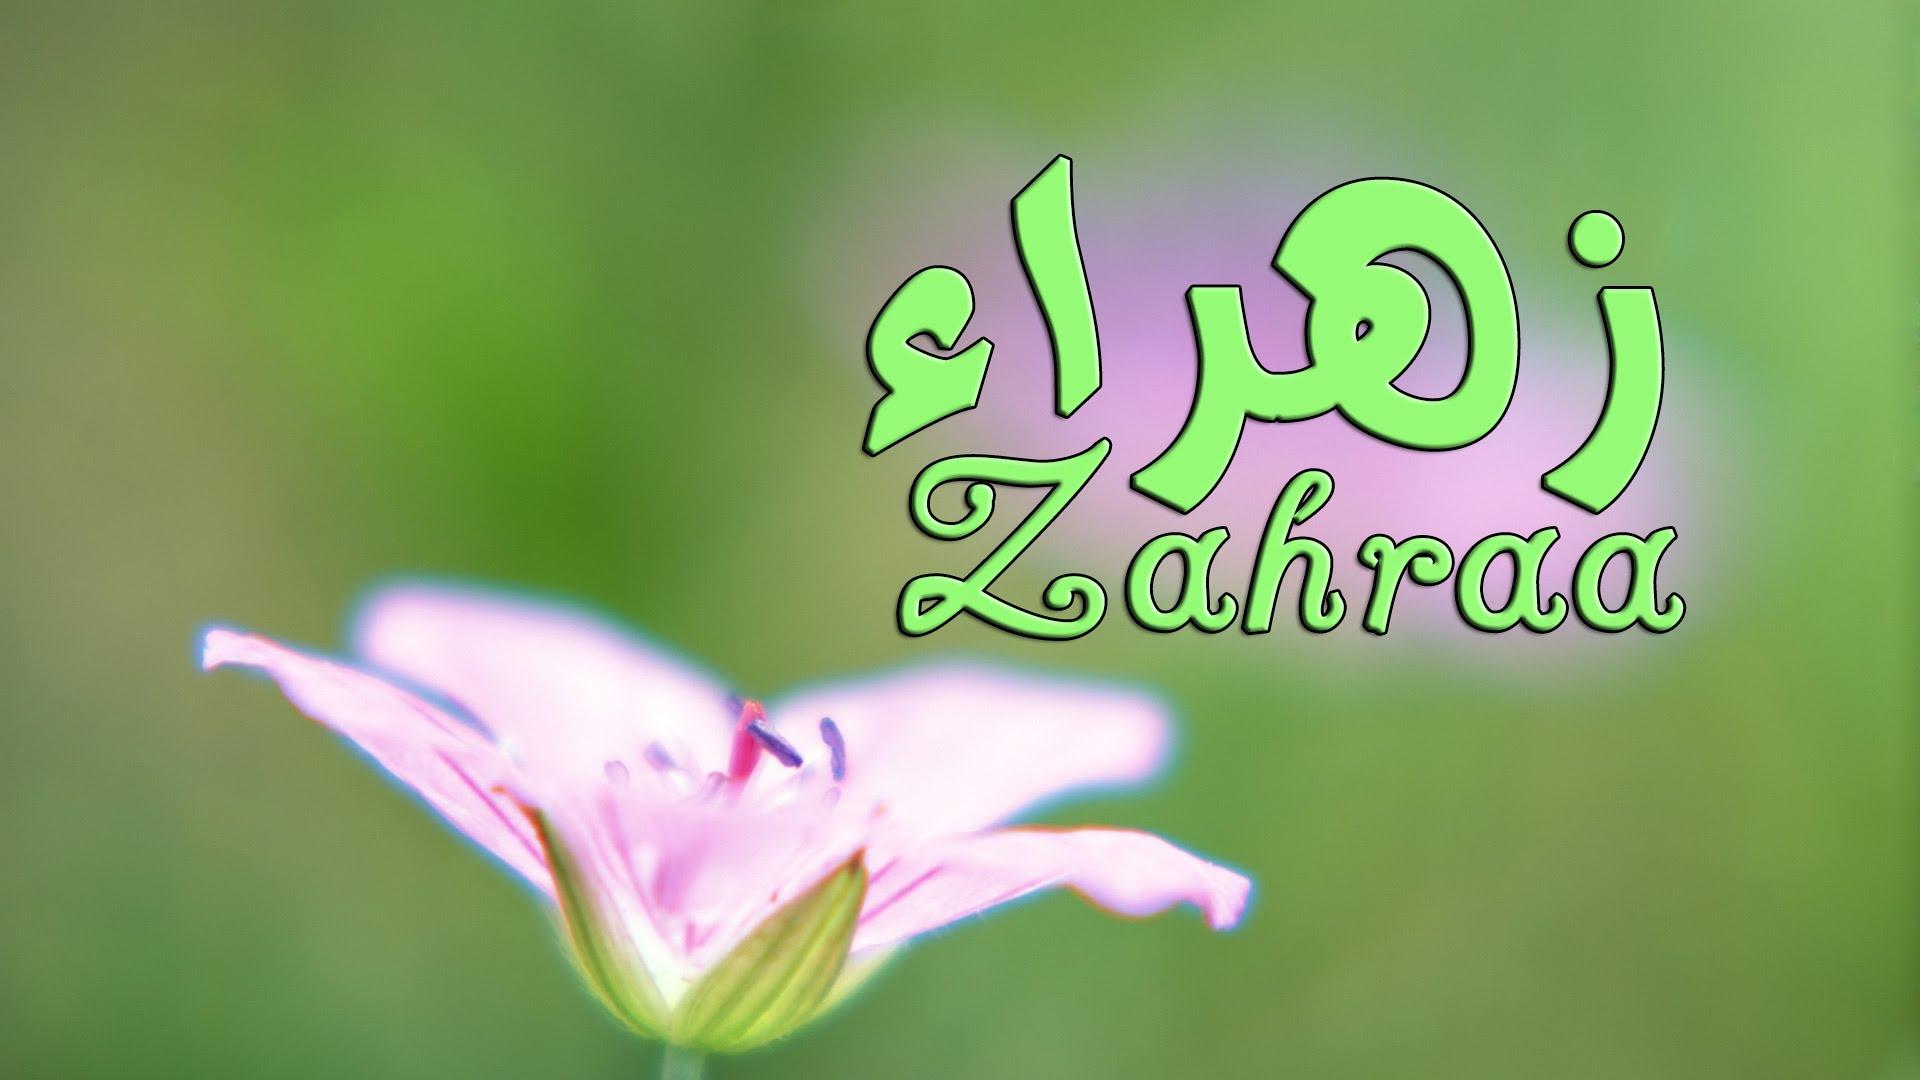 صور اسم زهراء , صور لاسم زهراء